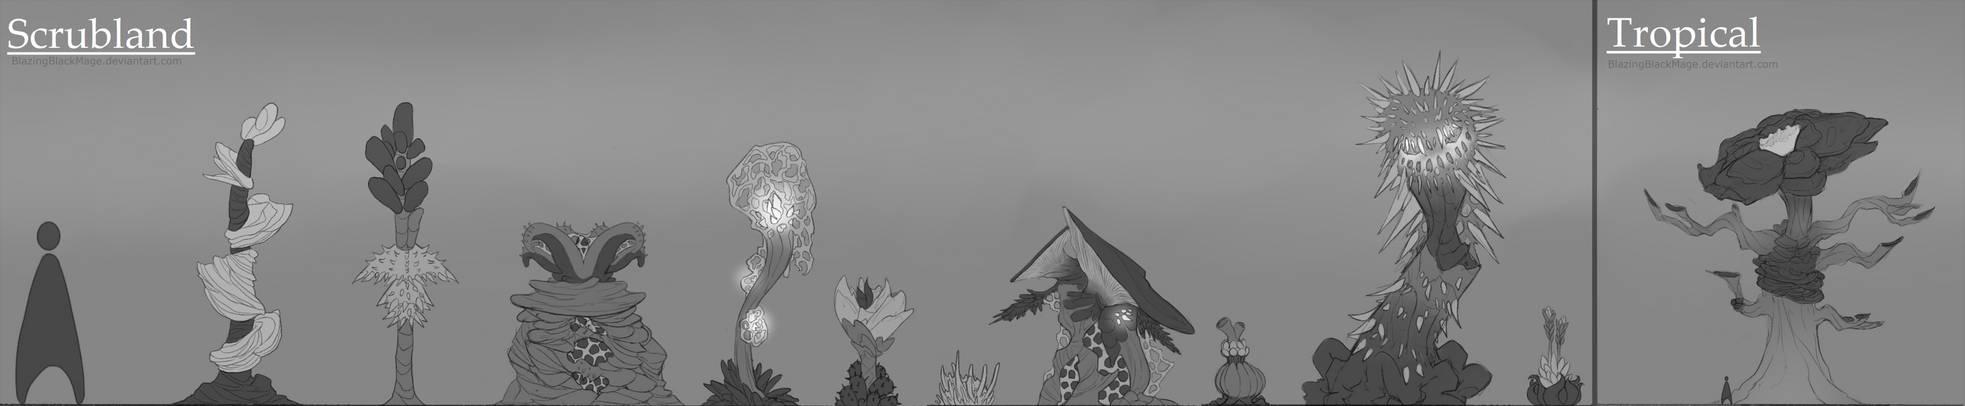 Triuncona Plant Concepts